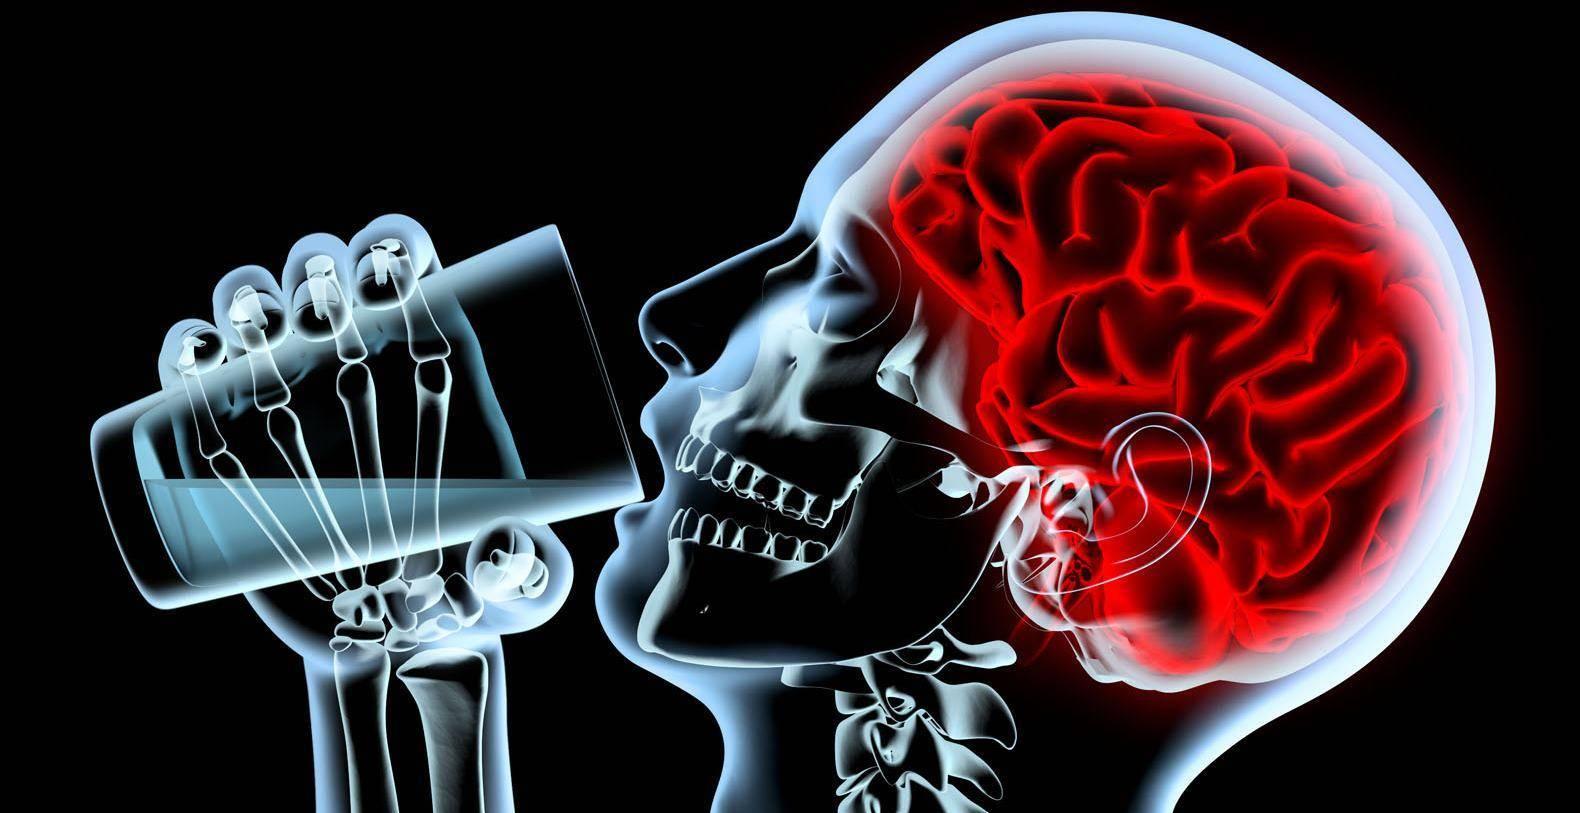 Как алкоголь влияет на мозг человека? - brainapps.ru